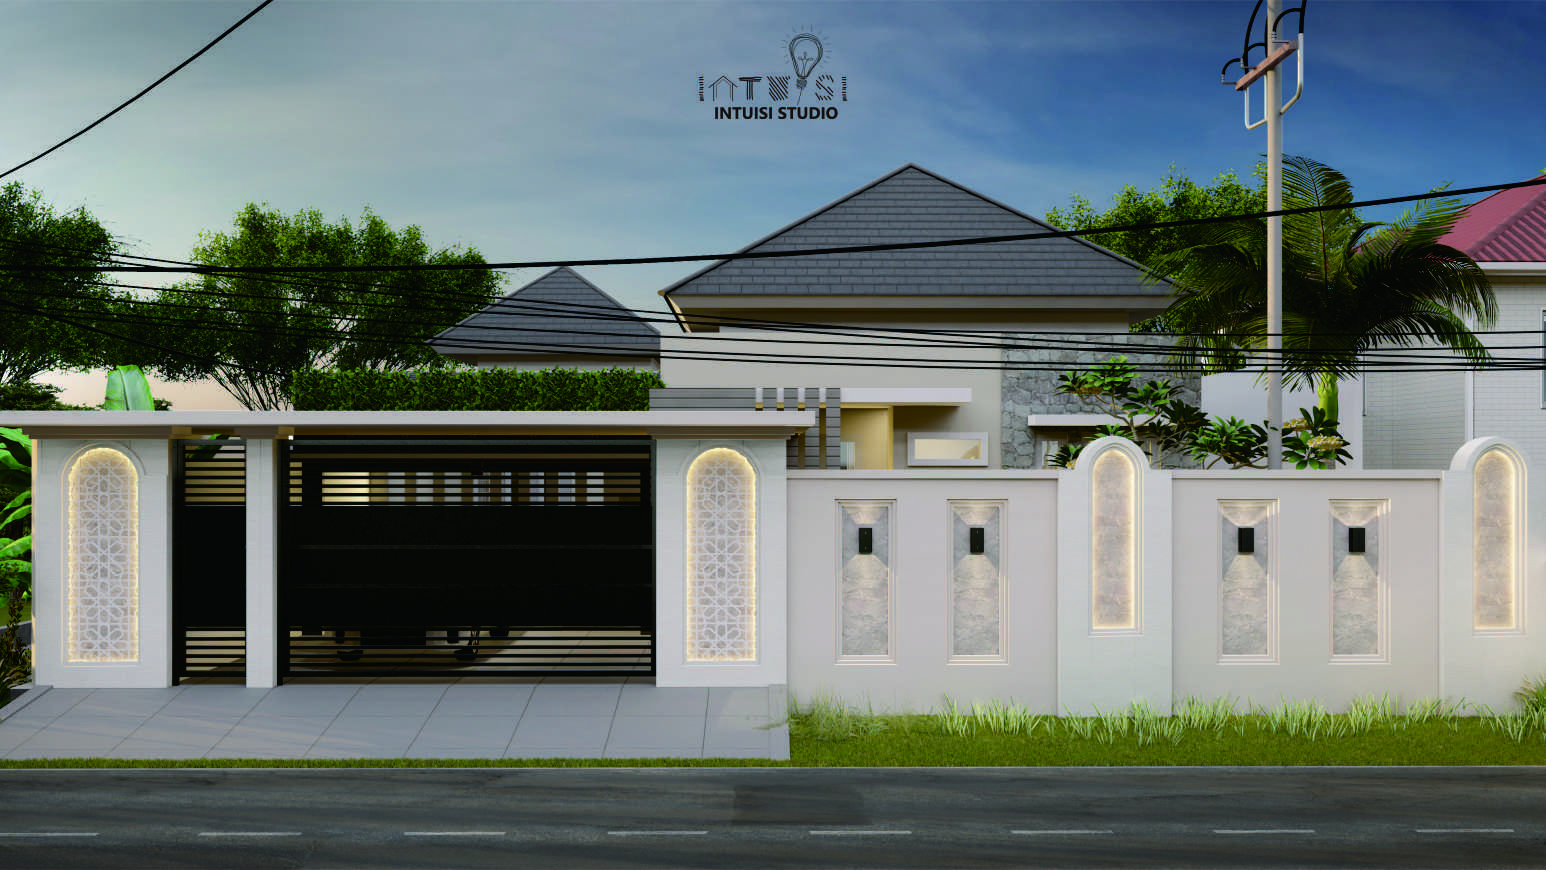 Intuisi Studio Desain Pagar Kabupaten Jombang, Jawa Timur, Indonesia Kabupaten Jombang, Jawa Timur, Indonesia Intuisi-Studio-Desain-Pagar  133004